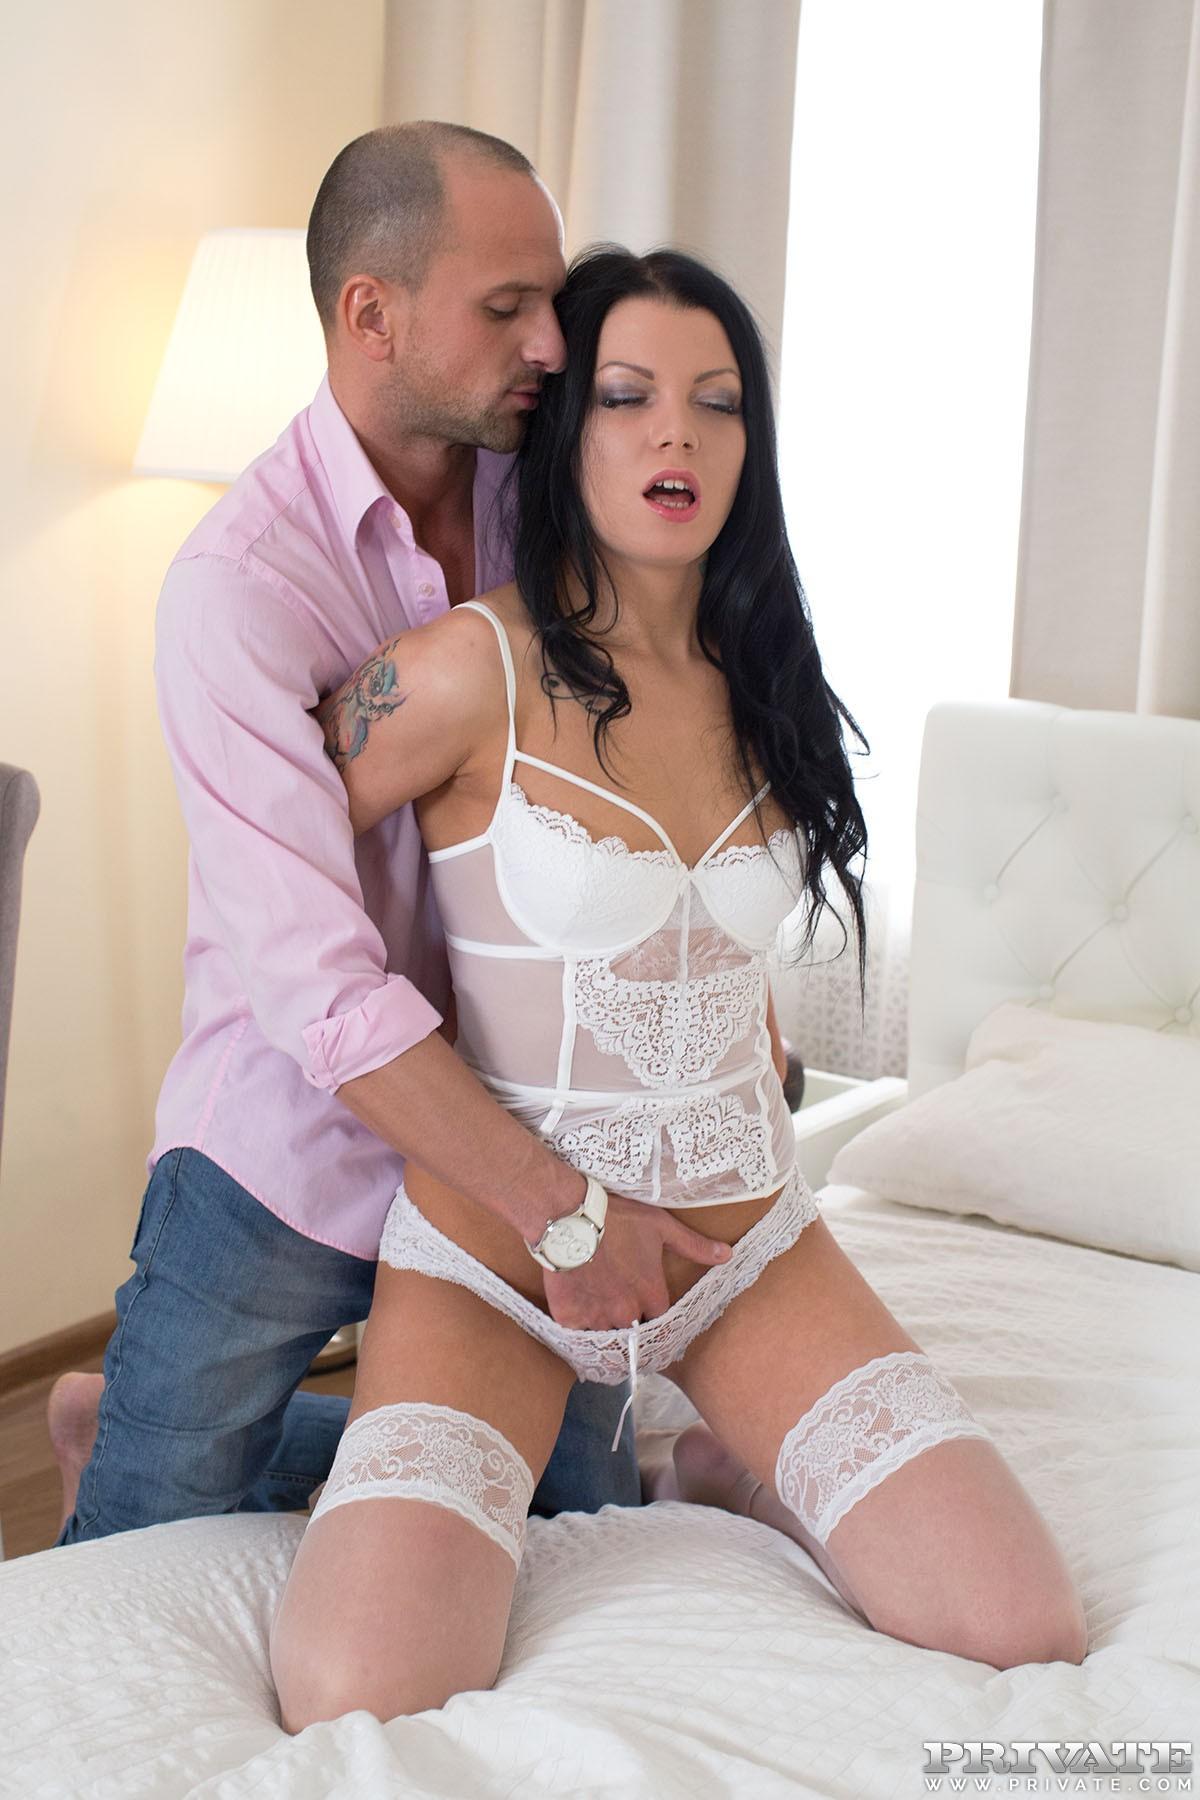 web cam masturbation videos